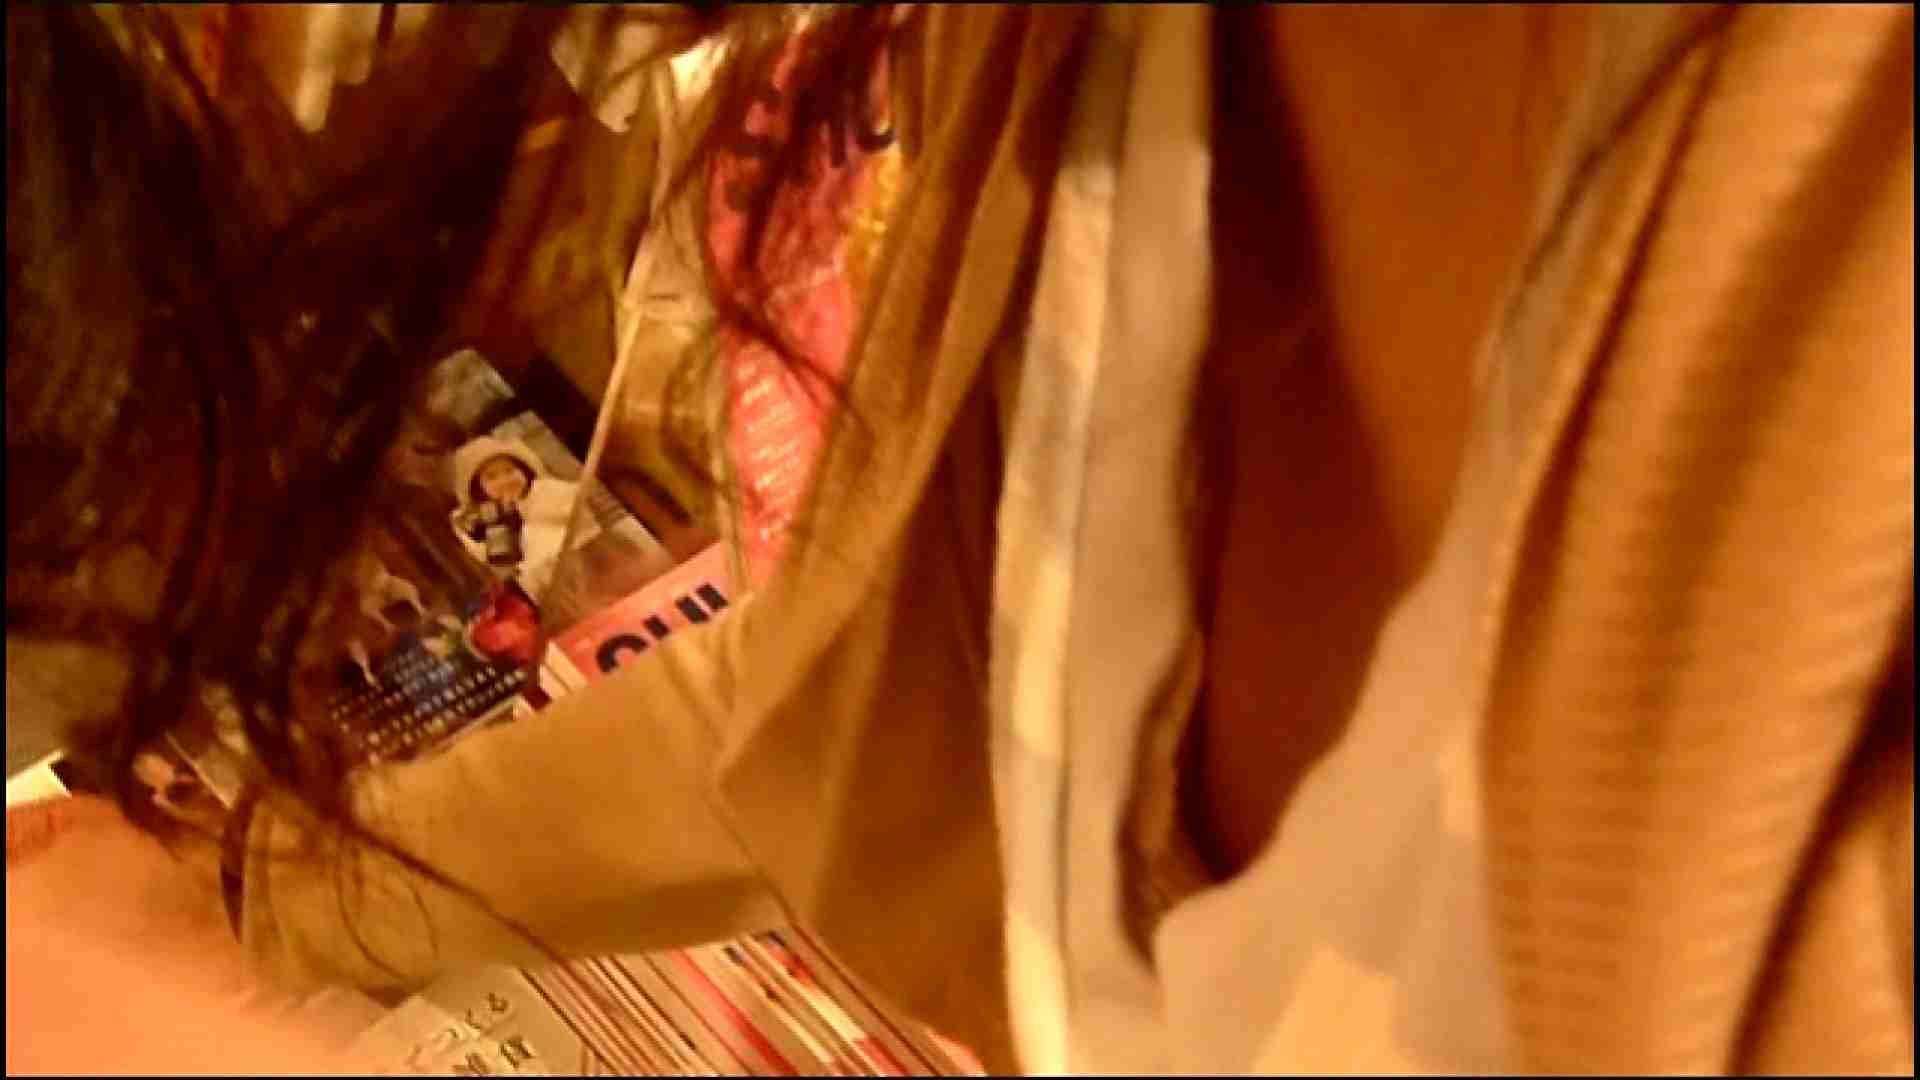 NO.3 某イオNN店内のエレベーター前でケータイに夢中な女の子 0  50連発 4